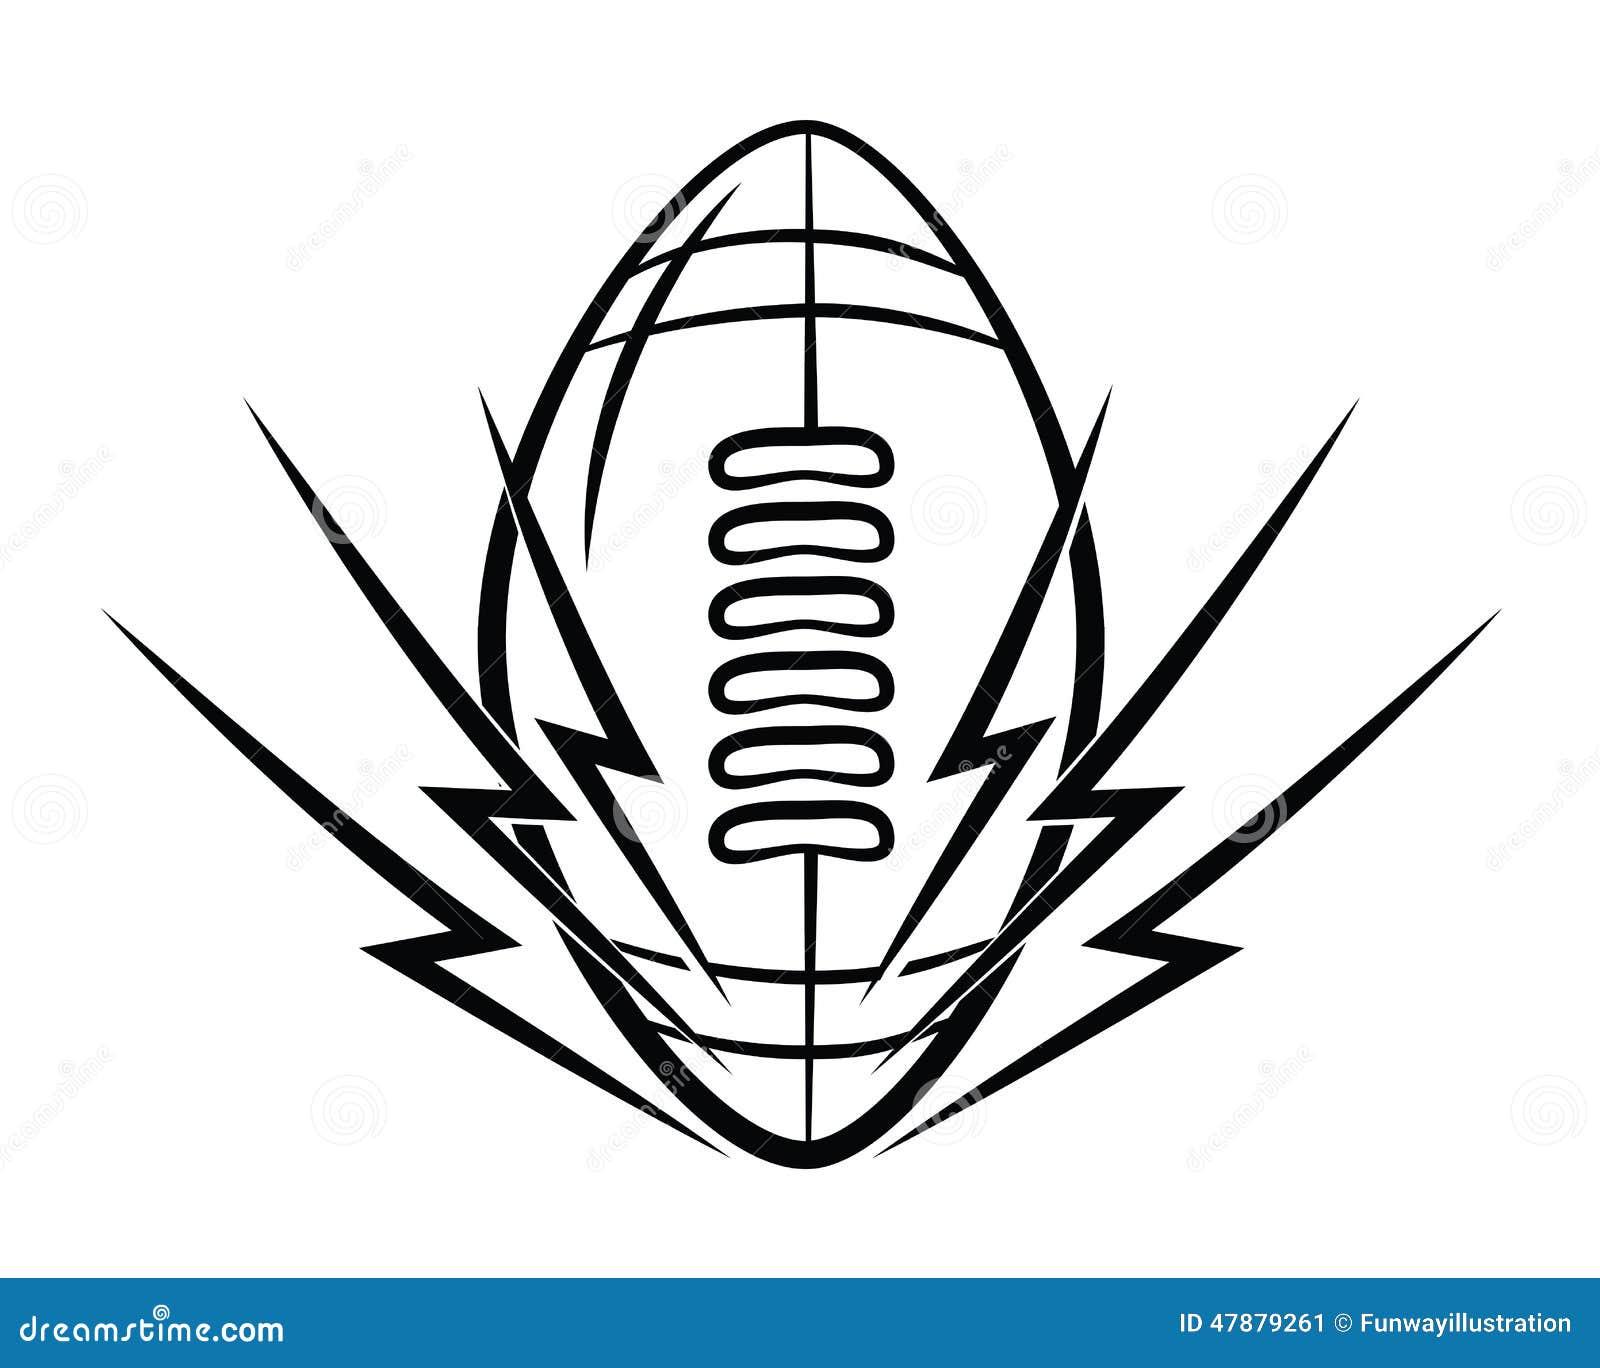 Football symbol stock vector illustration of symbol 47879261 football symbol buycottarizona